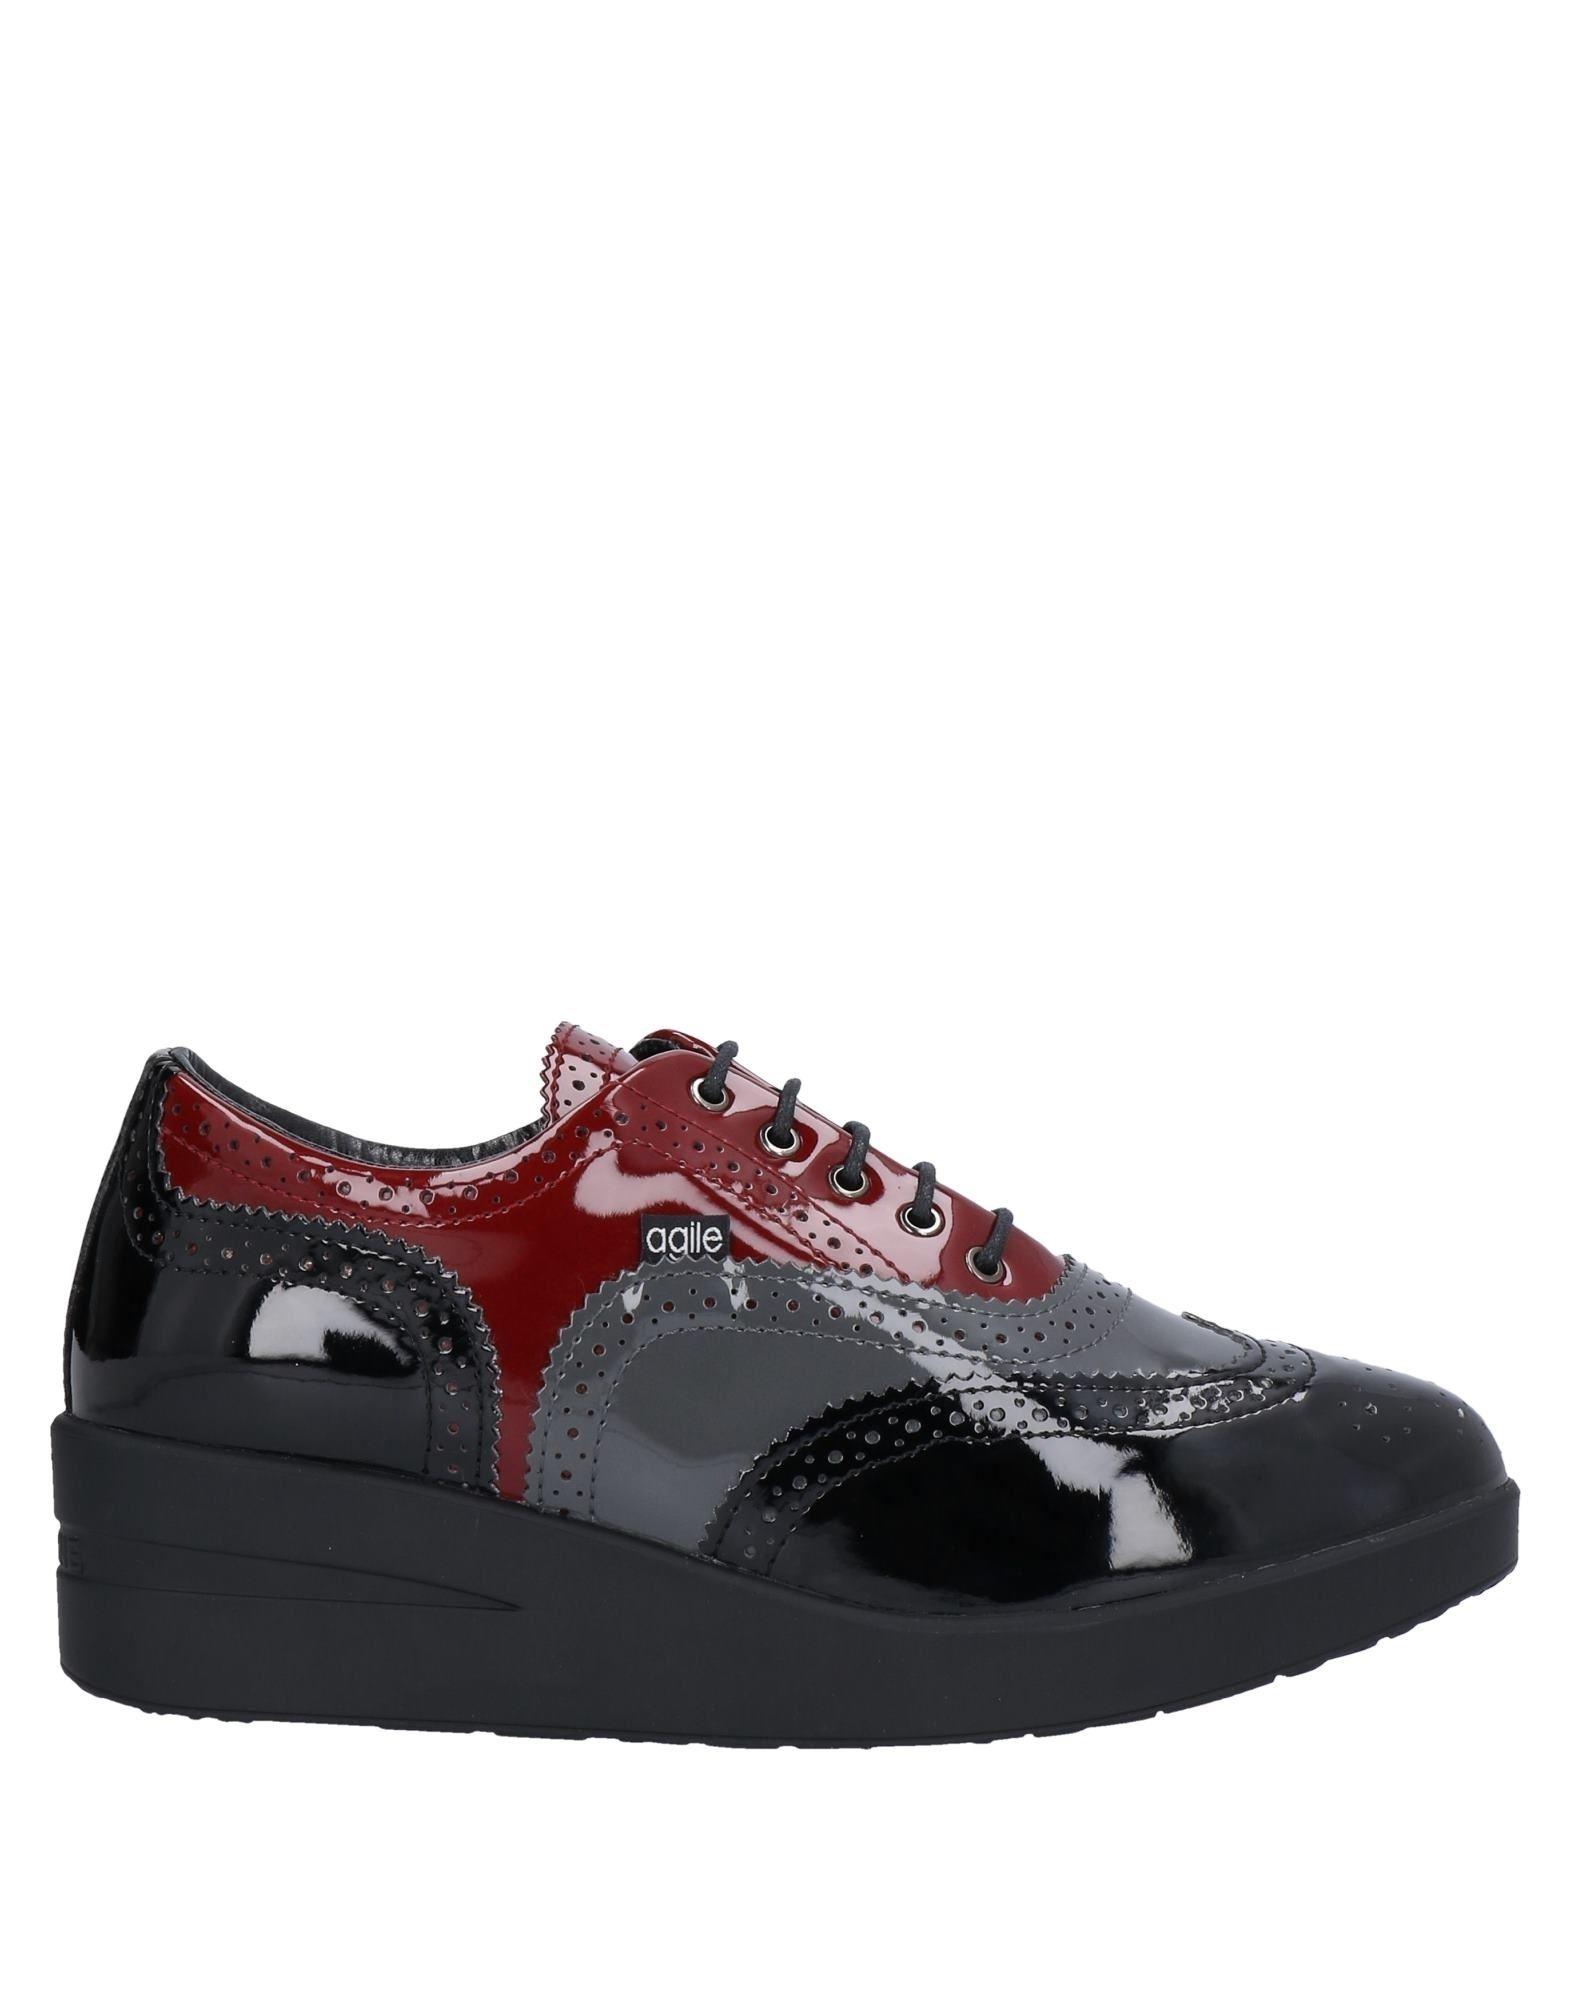 AGILE by RUCOLINE Обувь на шнурках claudia by isaberi обувь на шнурках